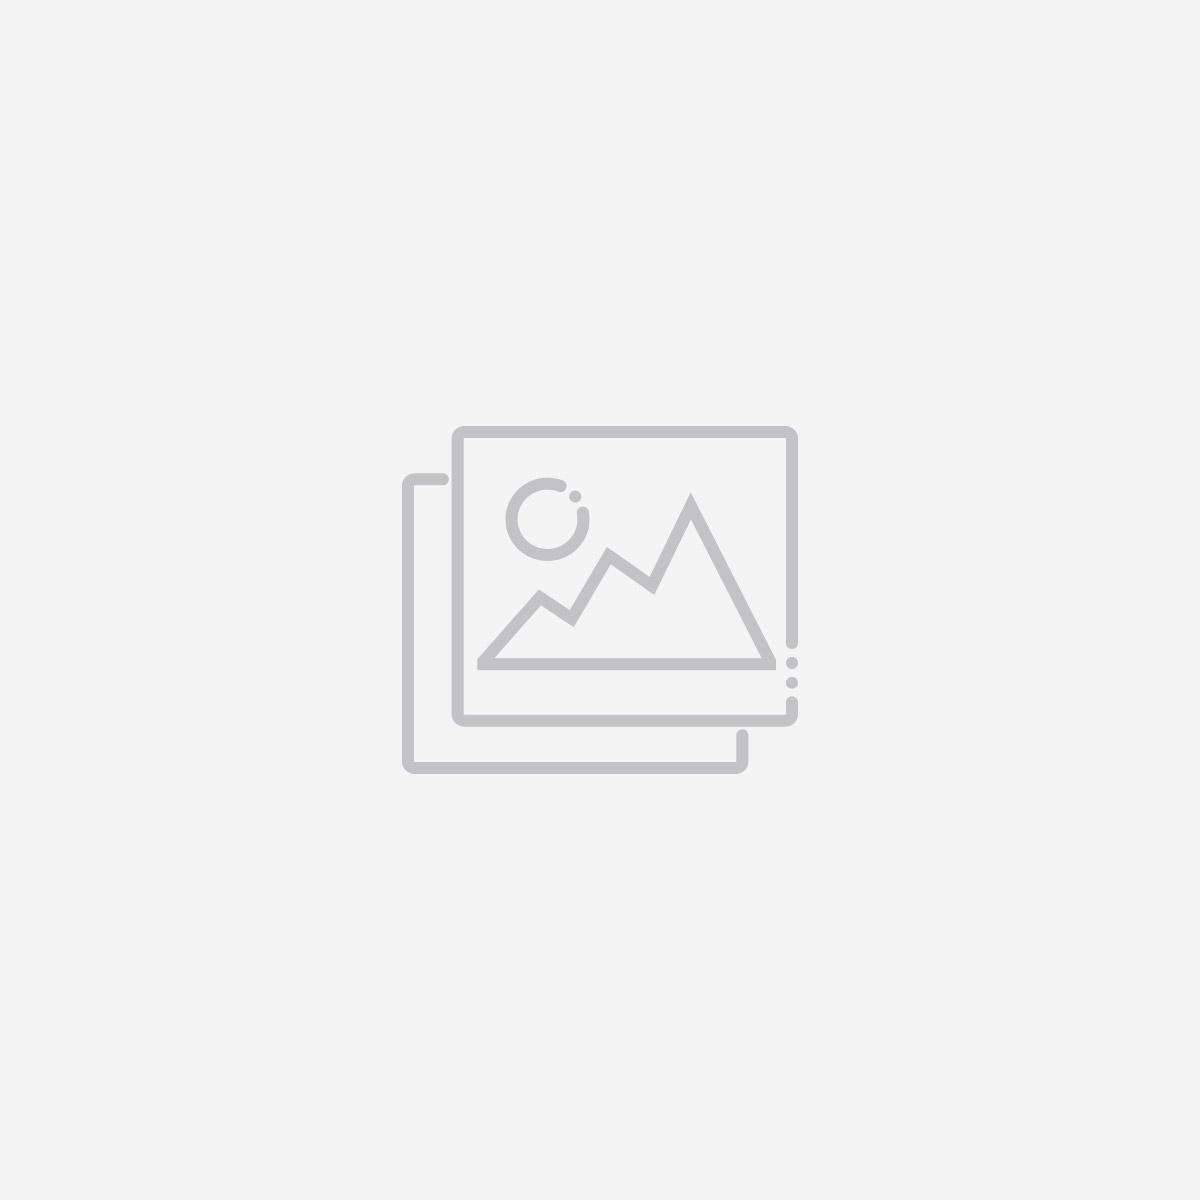 Executive Management | Landis+Gyr